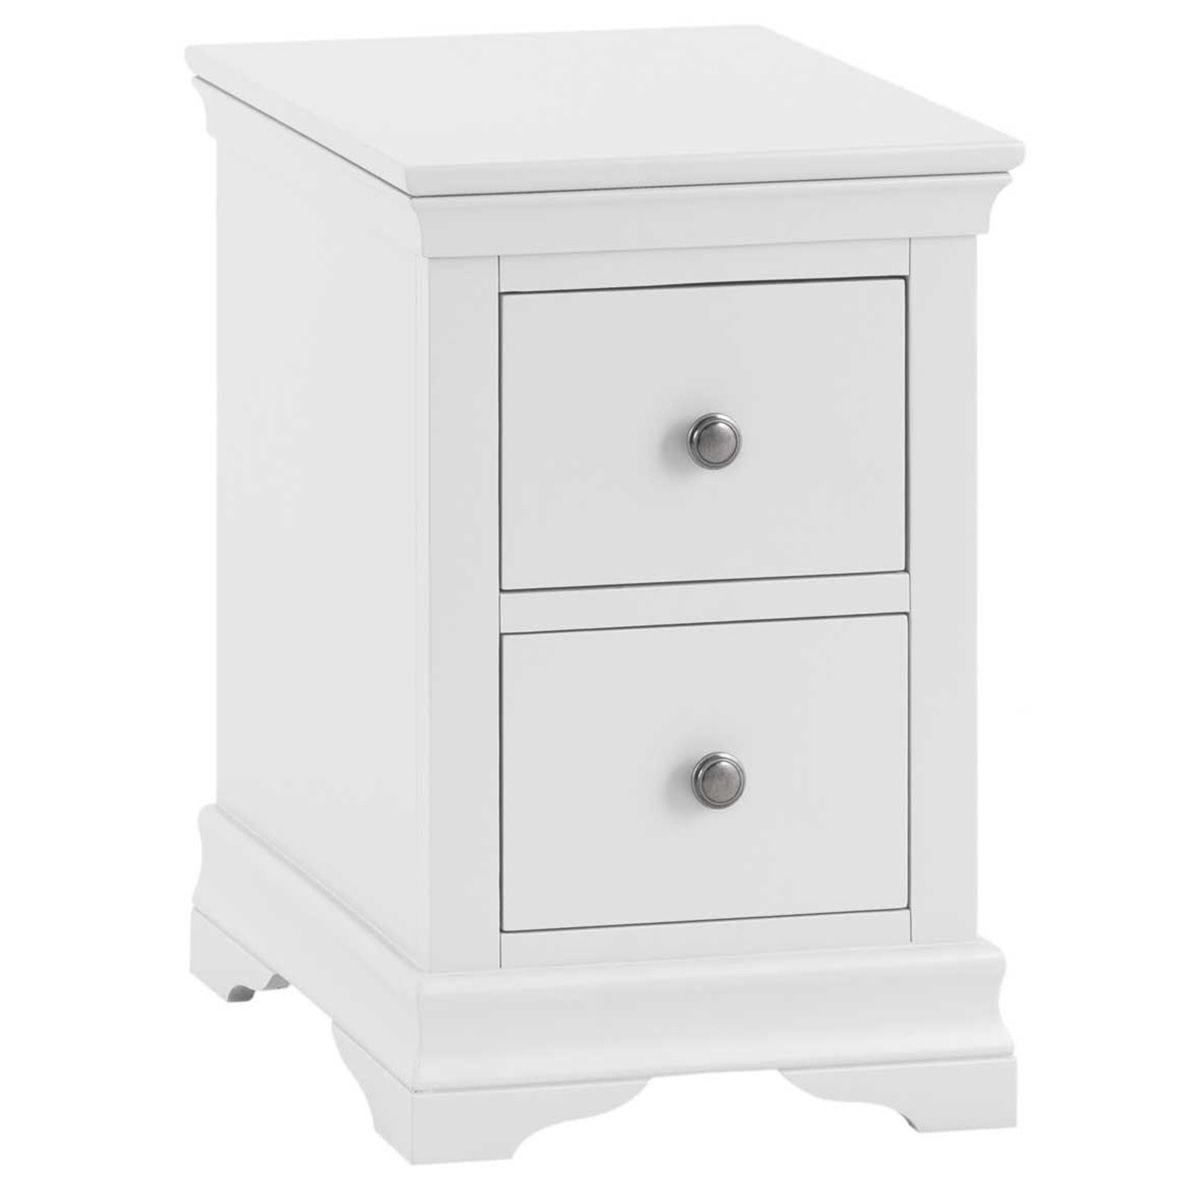 Sewla 2 Drawer Bedside Table - White